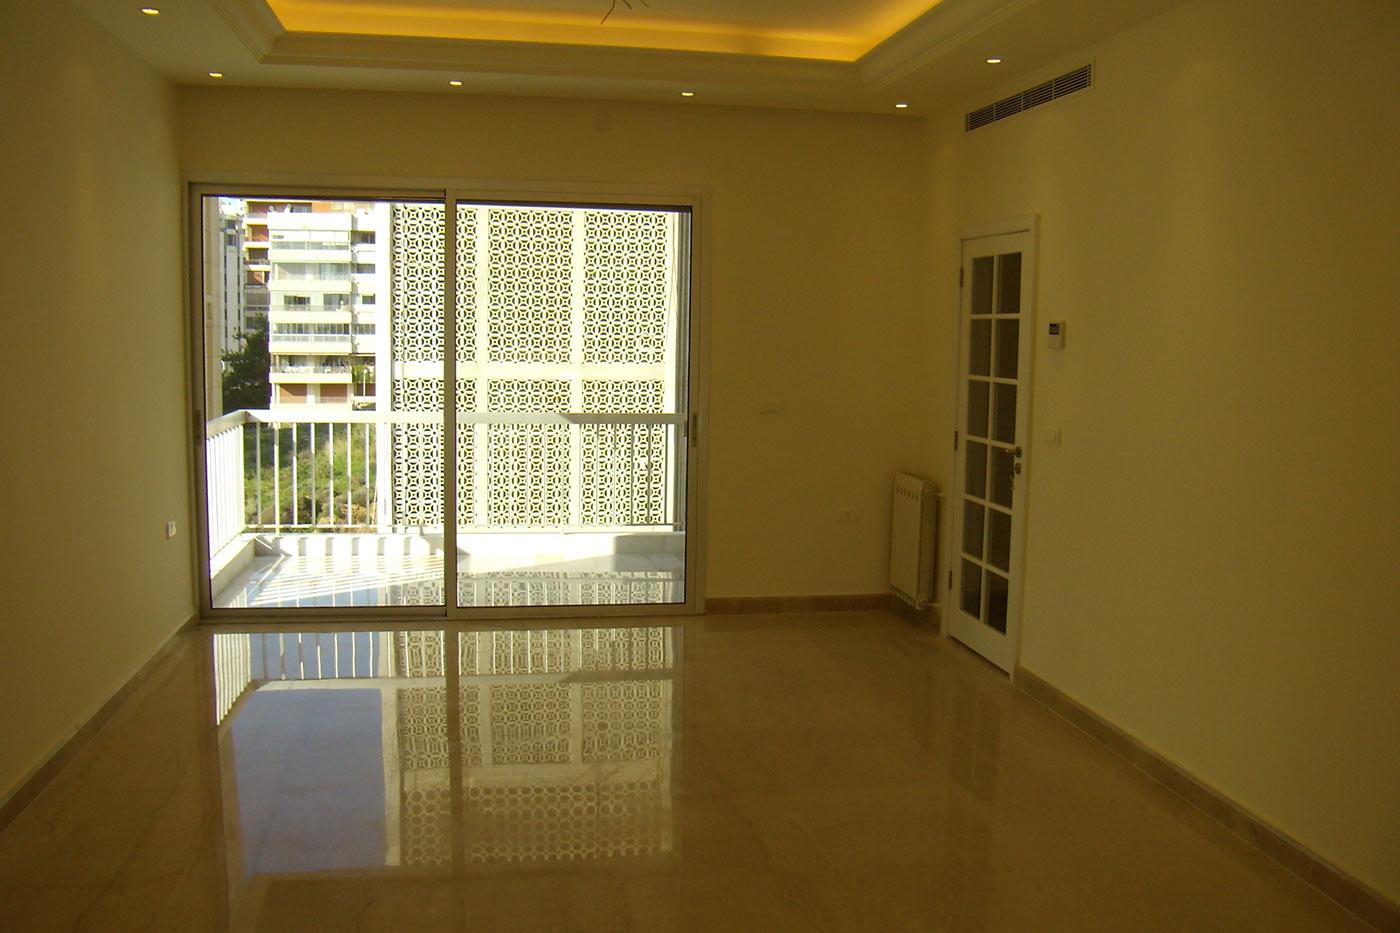 Sankari Residence - Room to Balcony with Glass Sliding Door